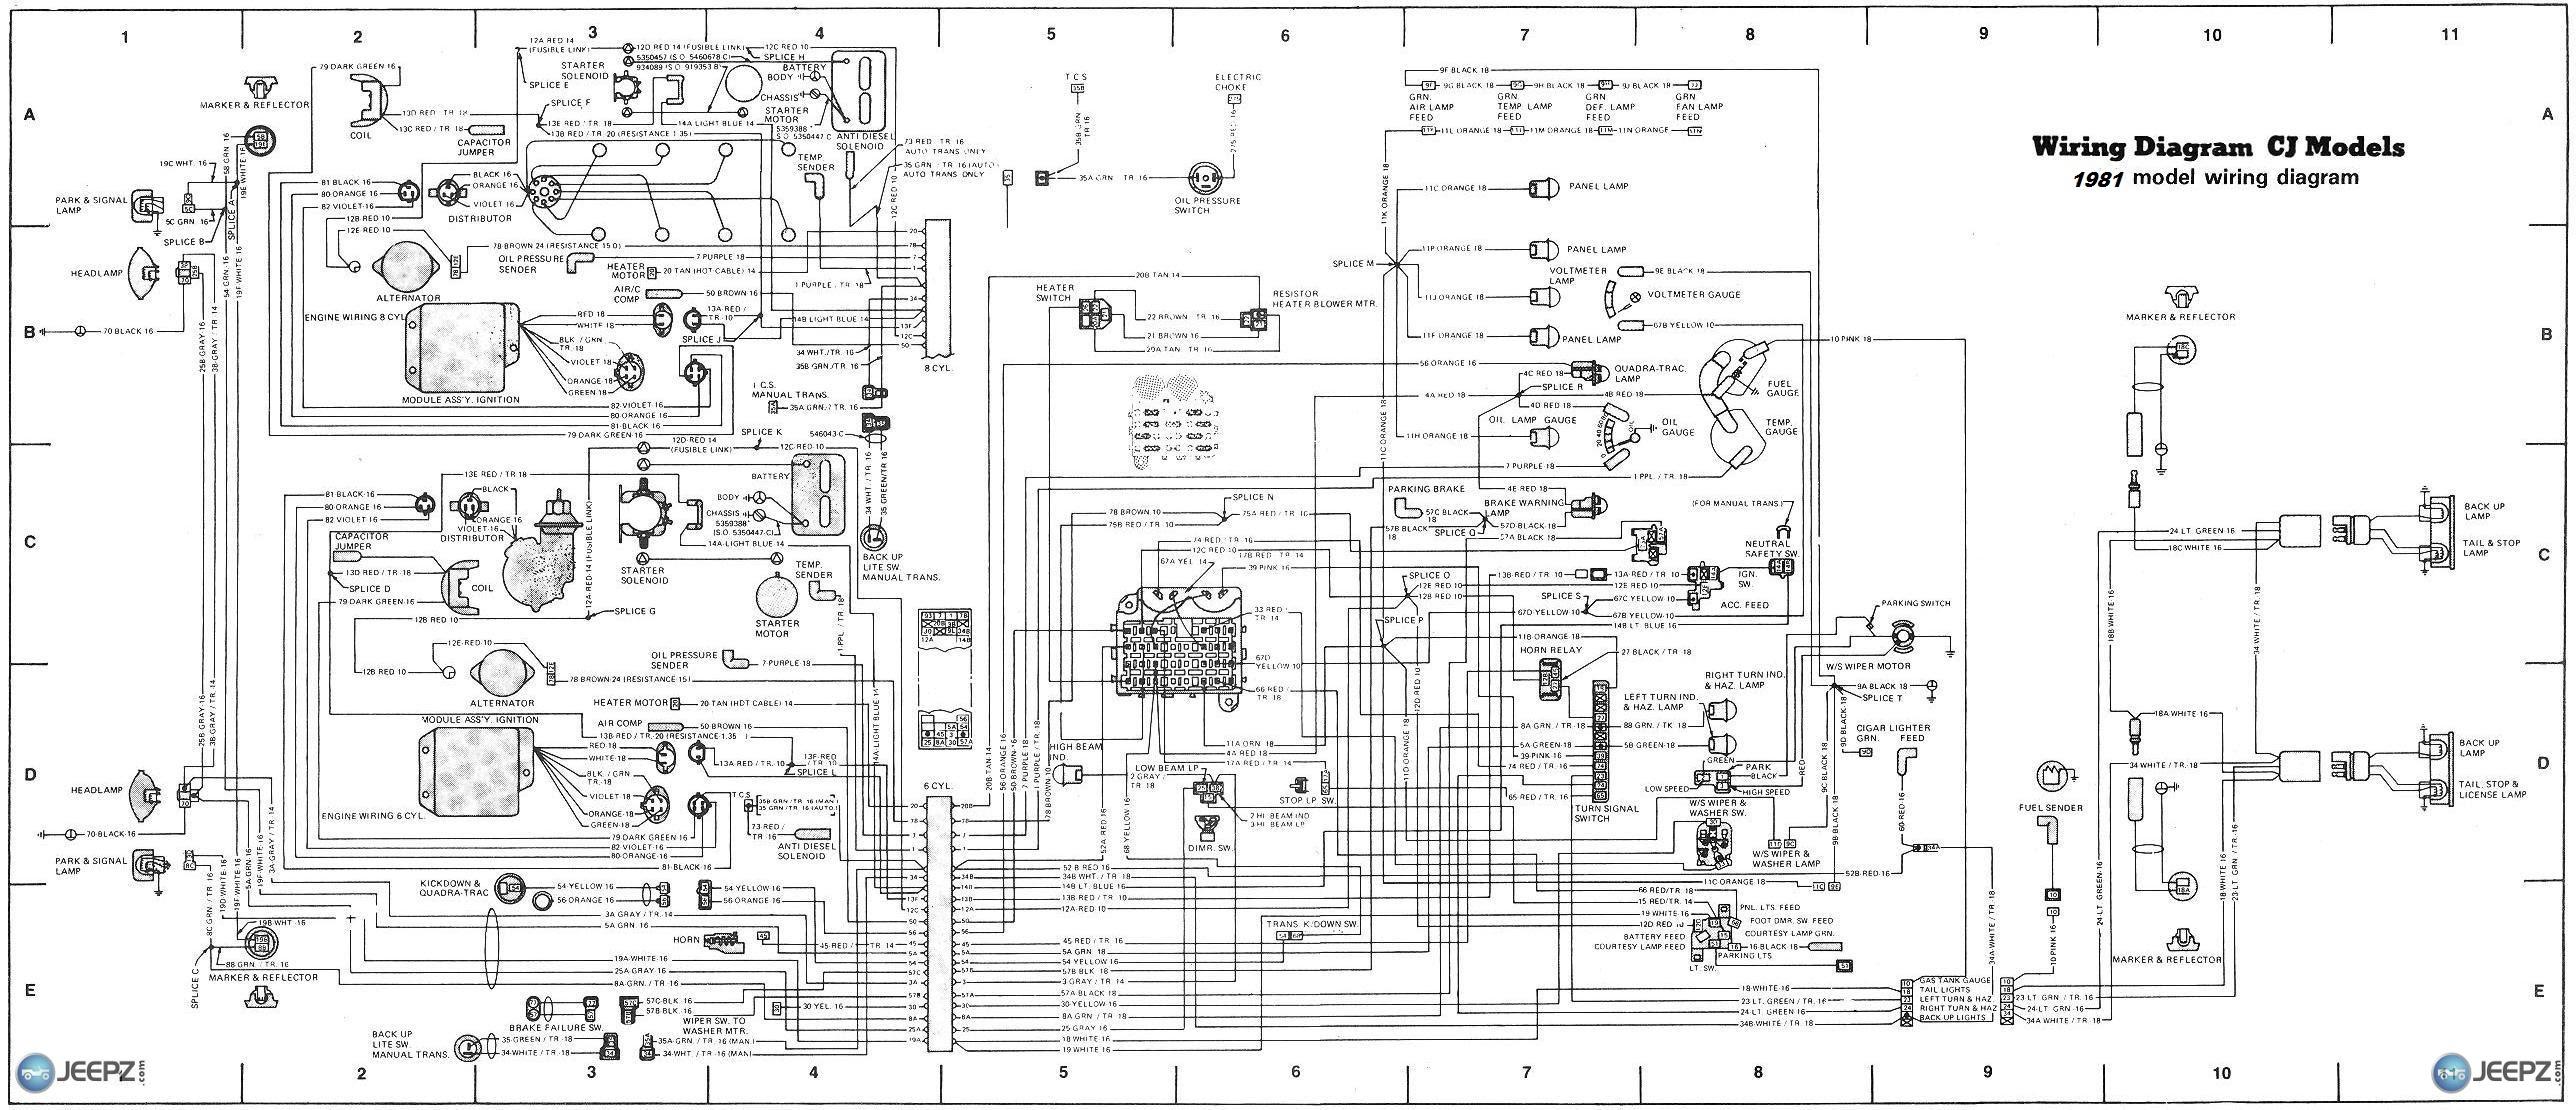 Diagram Of 1982 Jeep Cj7 Engine - Wiring Diagramcars-trucks24.blogspot.com